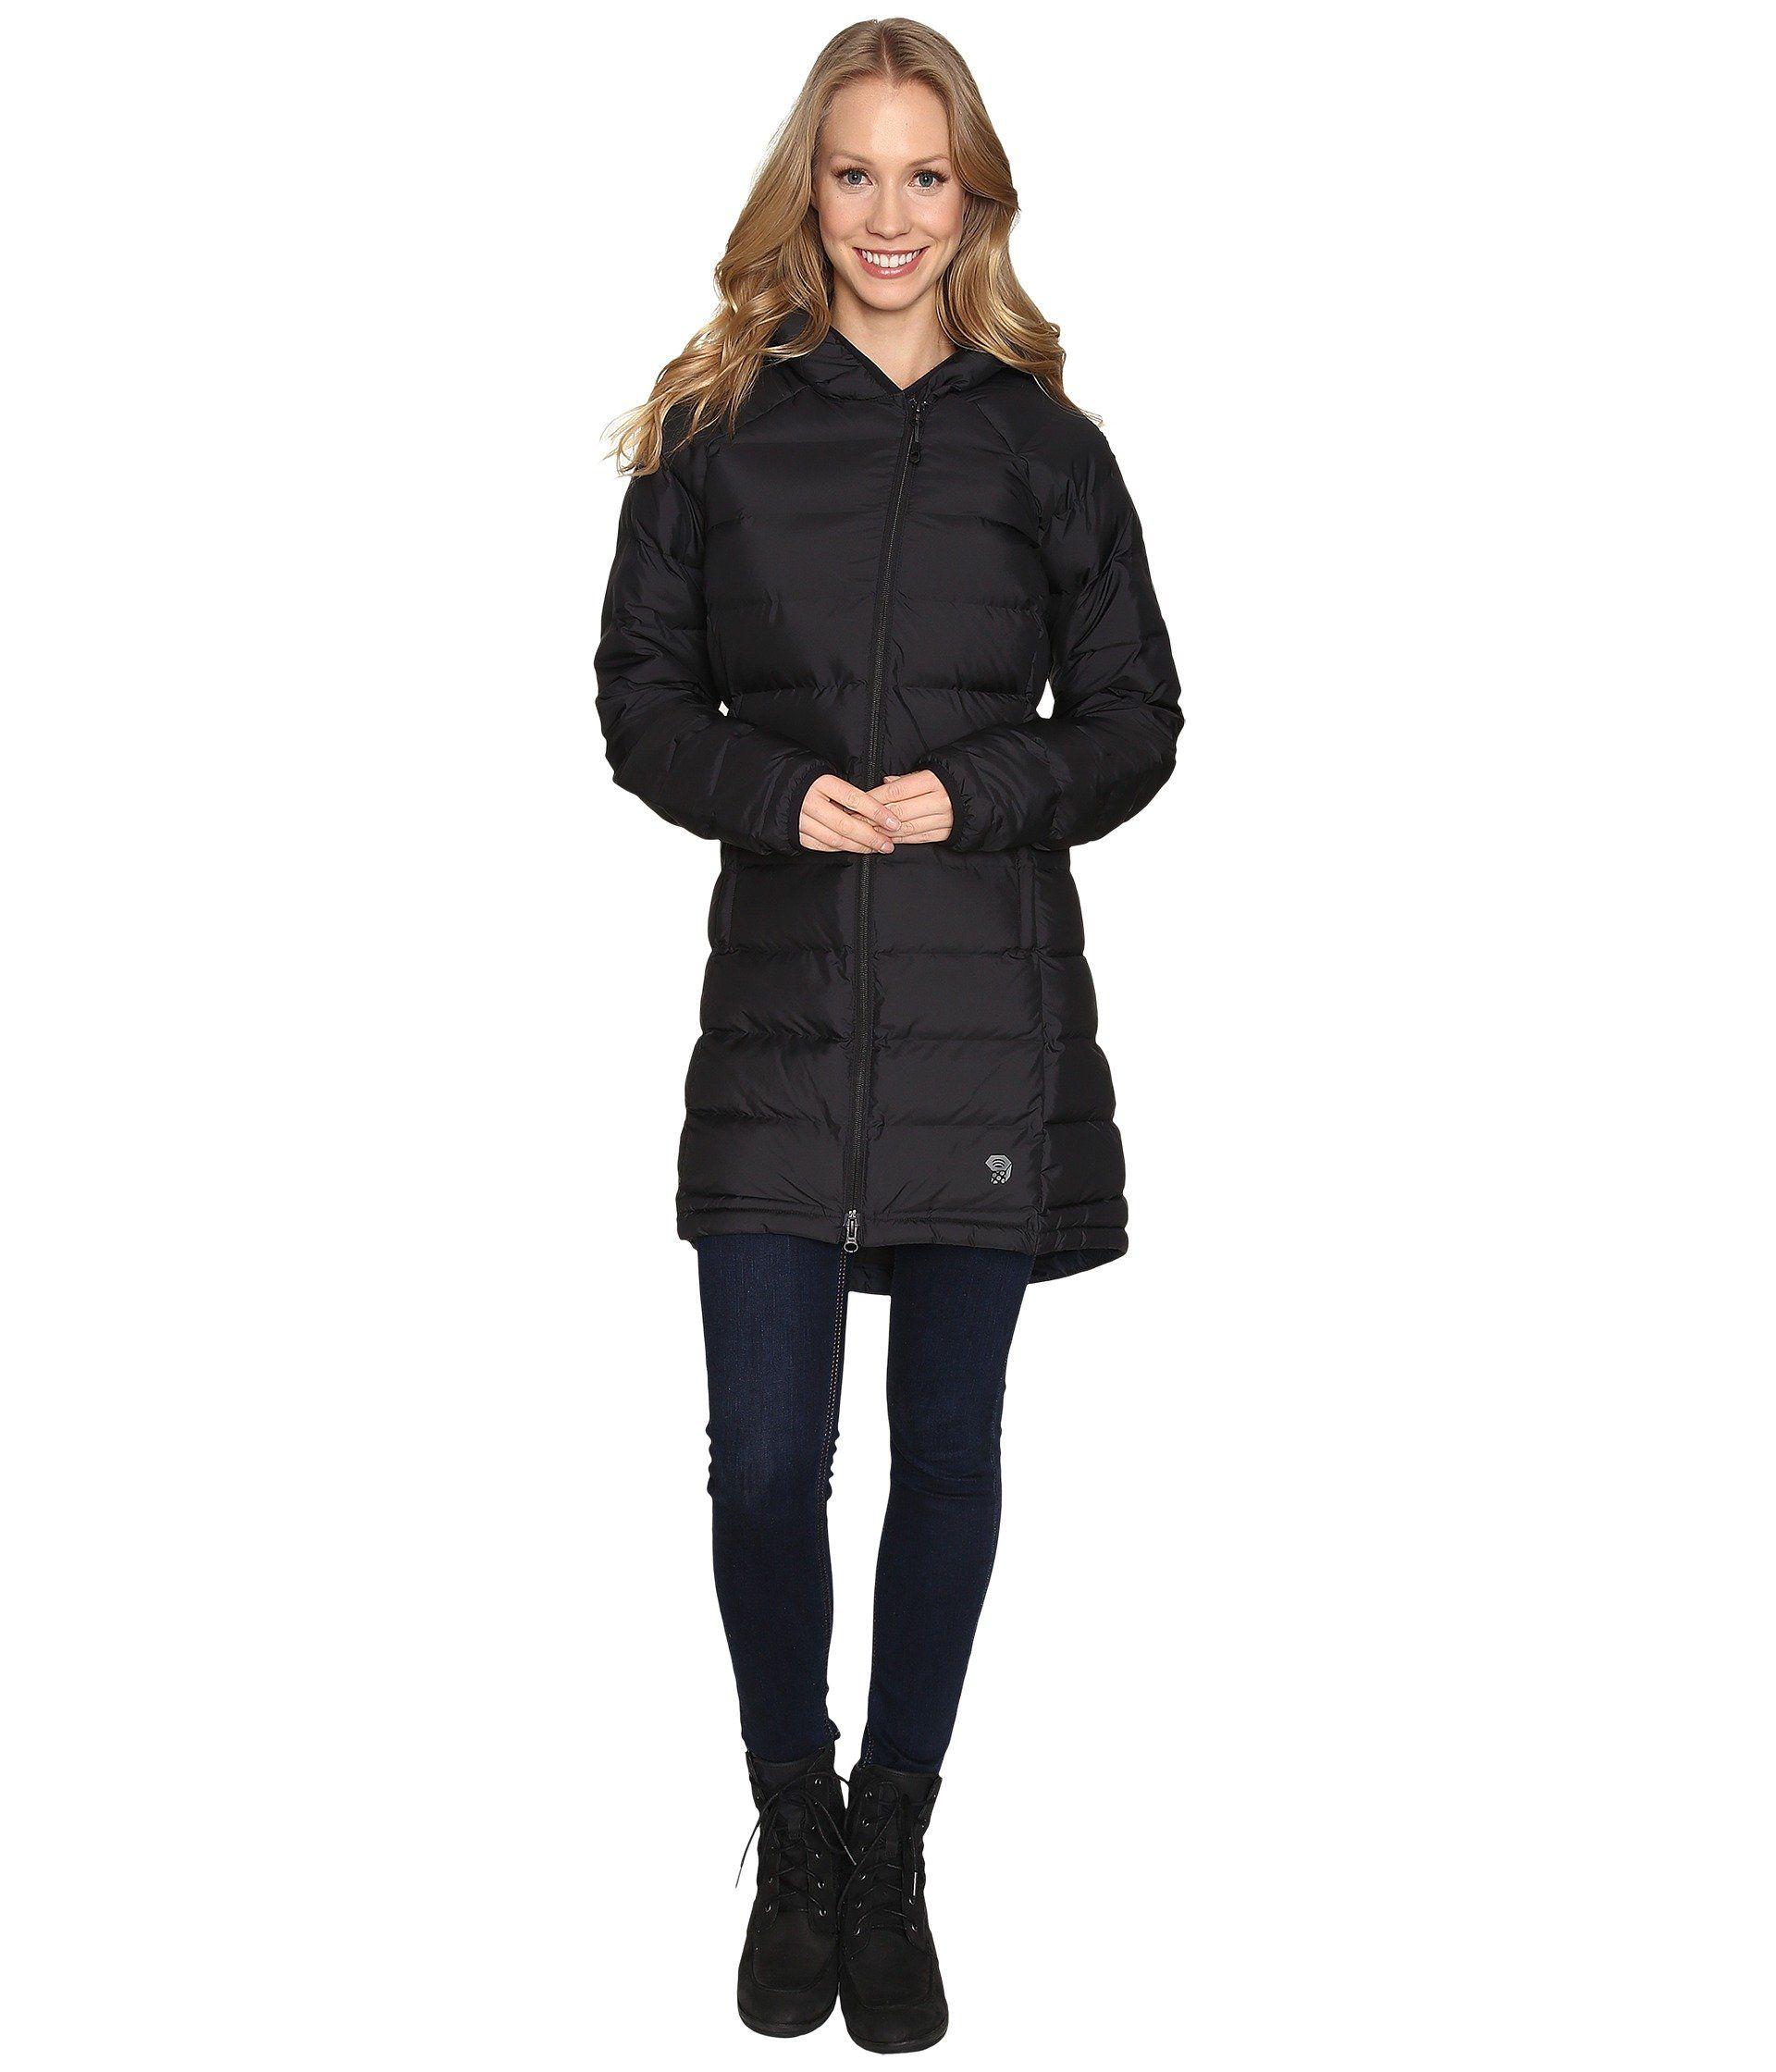 Mountain Hardwear Thermacity Parka In Black Modesens Parka Winter Jackets Mountain Hardwear [ 2240 x 1920 Pixel ]